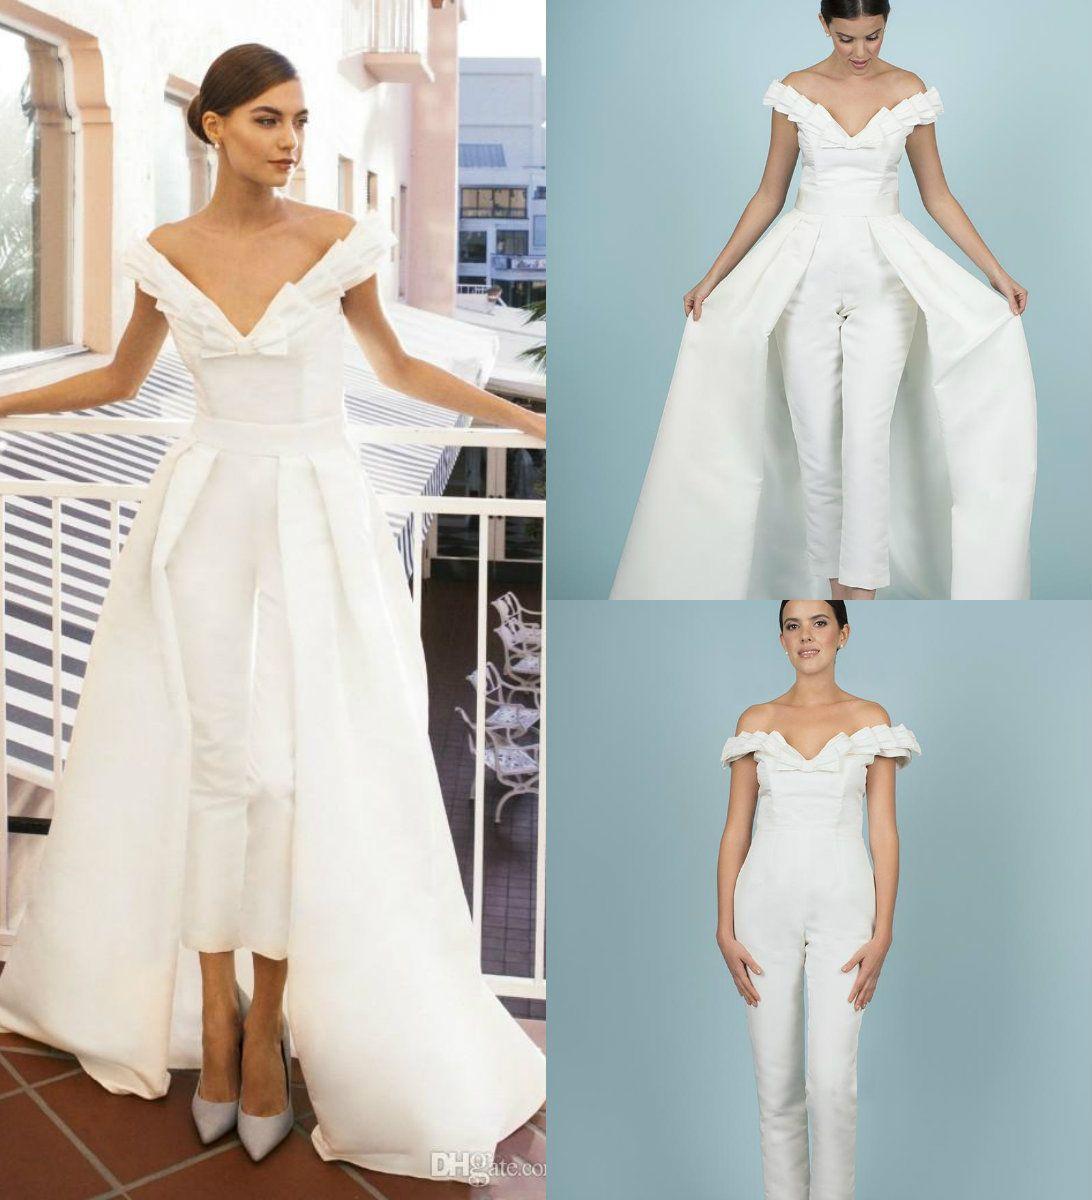 1df1eb1d672 New Women Jumpsuit With Long Train White Prom Dresses Off Shoulder Sweep  Train Elegant Evening Dress Party Zuhair Murad Dress Vestidos Festa Cheap  Long ...